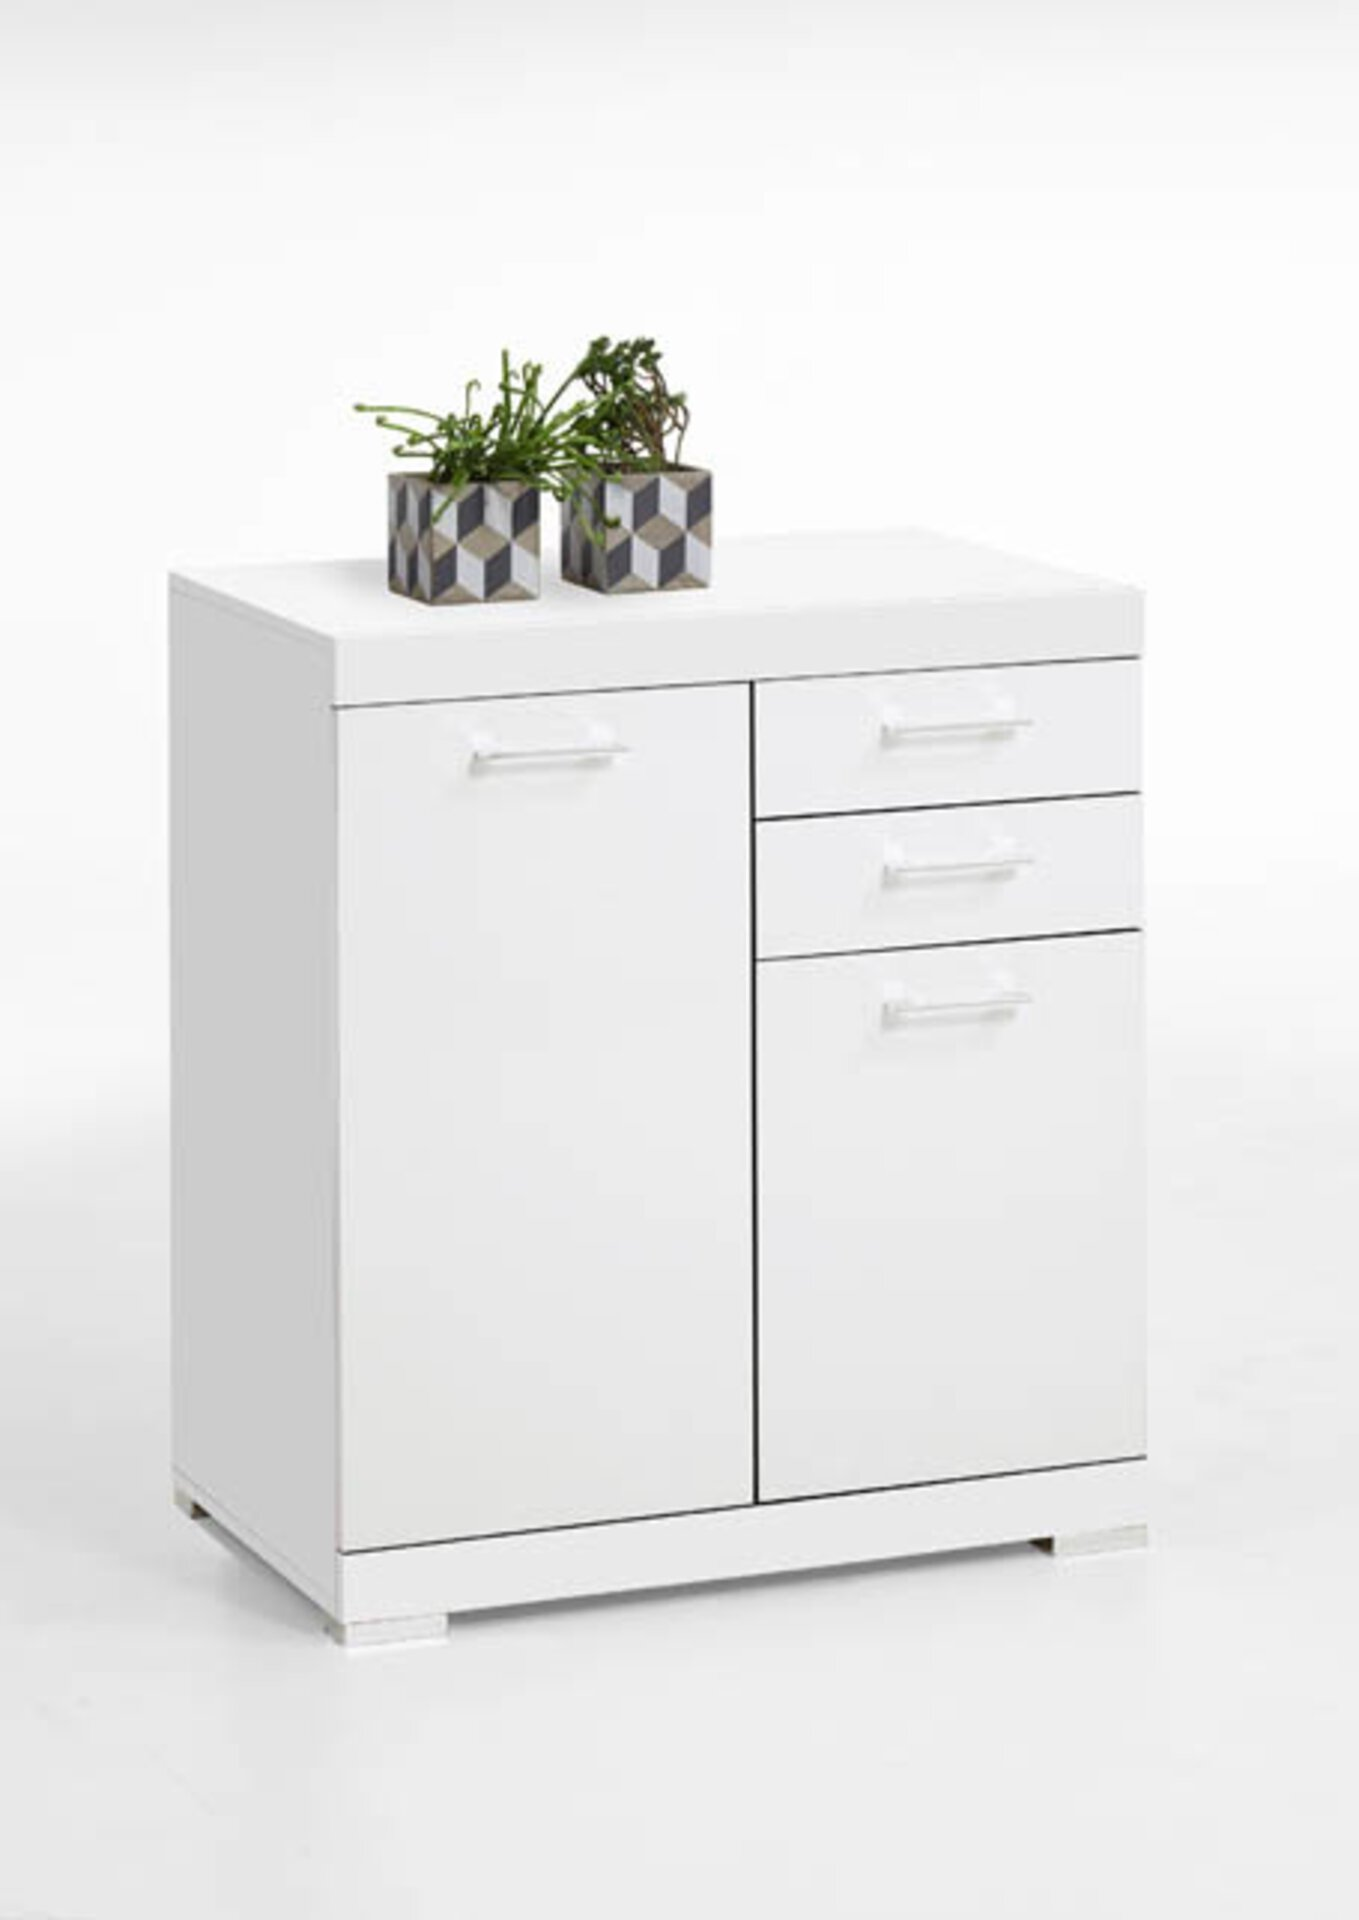 Kommode inbuy Holzwerkstoff weiß 90 x 50 x 80 cm